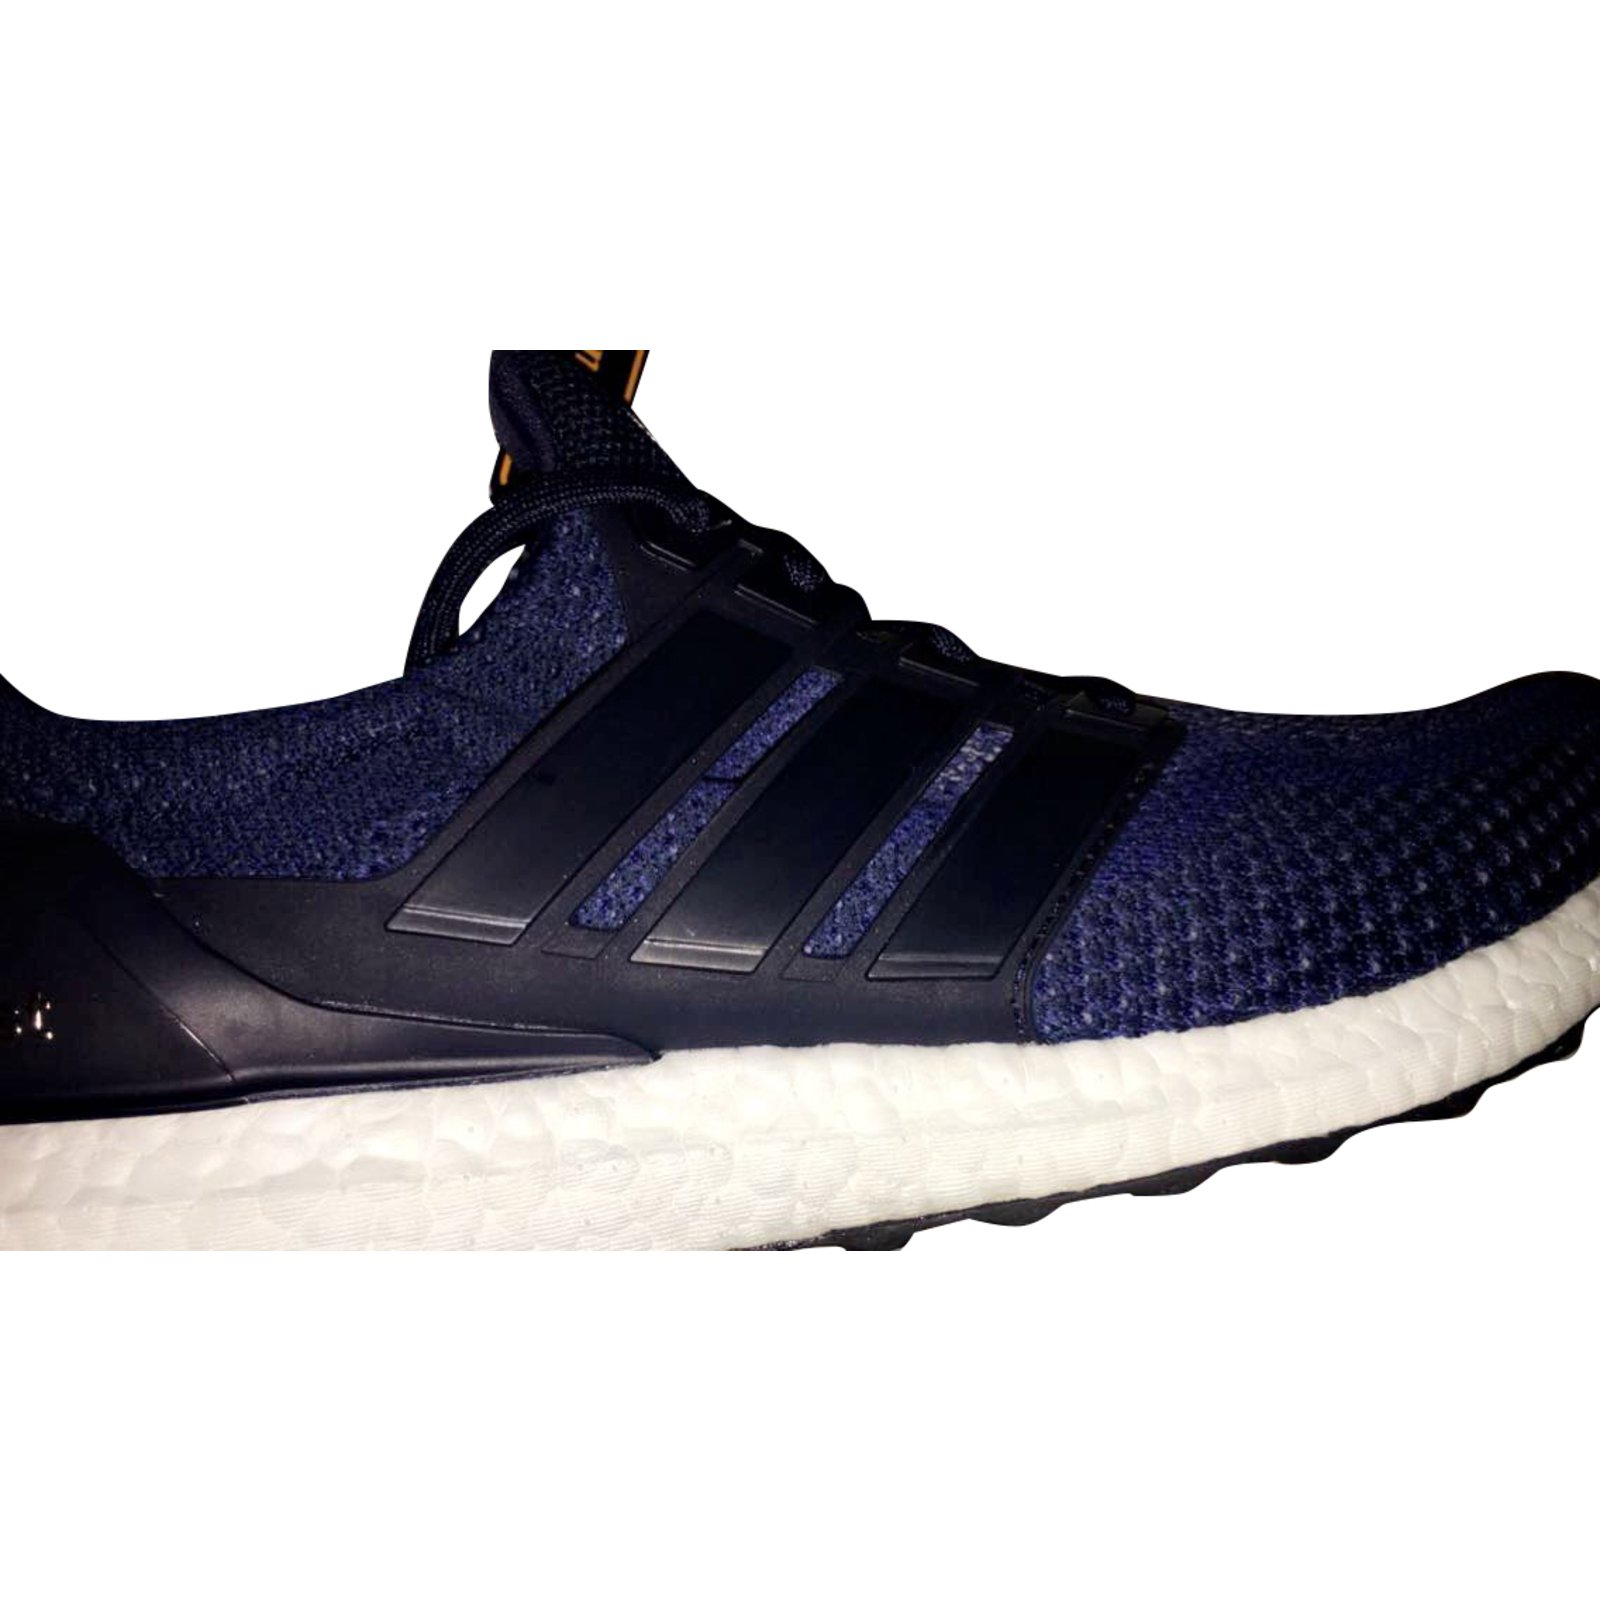 b72eade279ce Adidas Ultra boost M (AQ5928) Sneakers Synthetic Blue ref.31216 - Joli  Closet